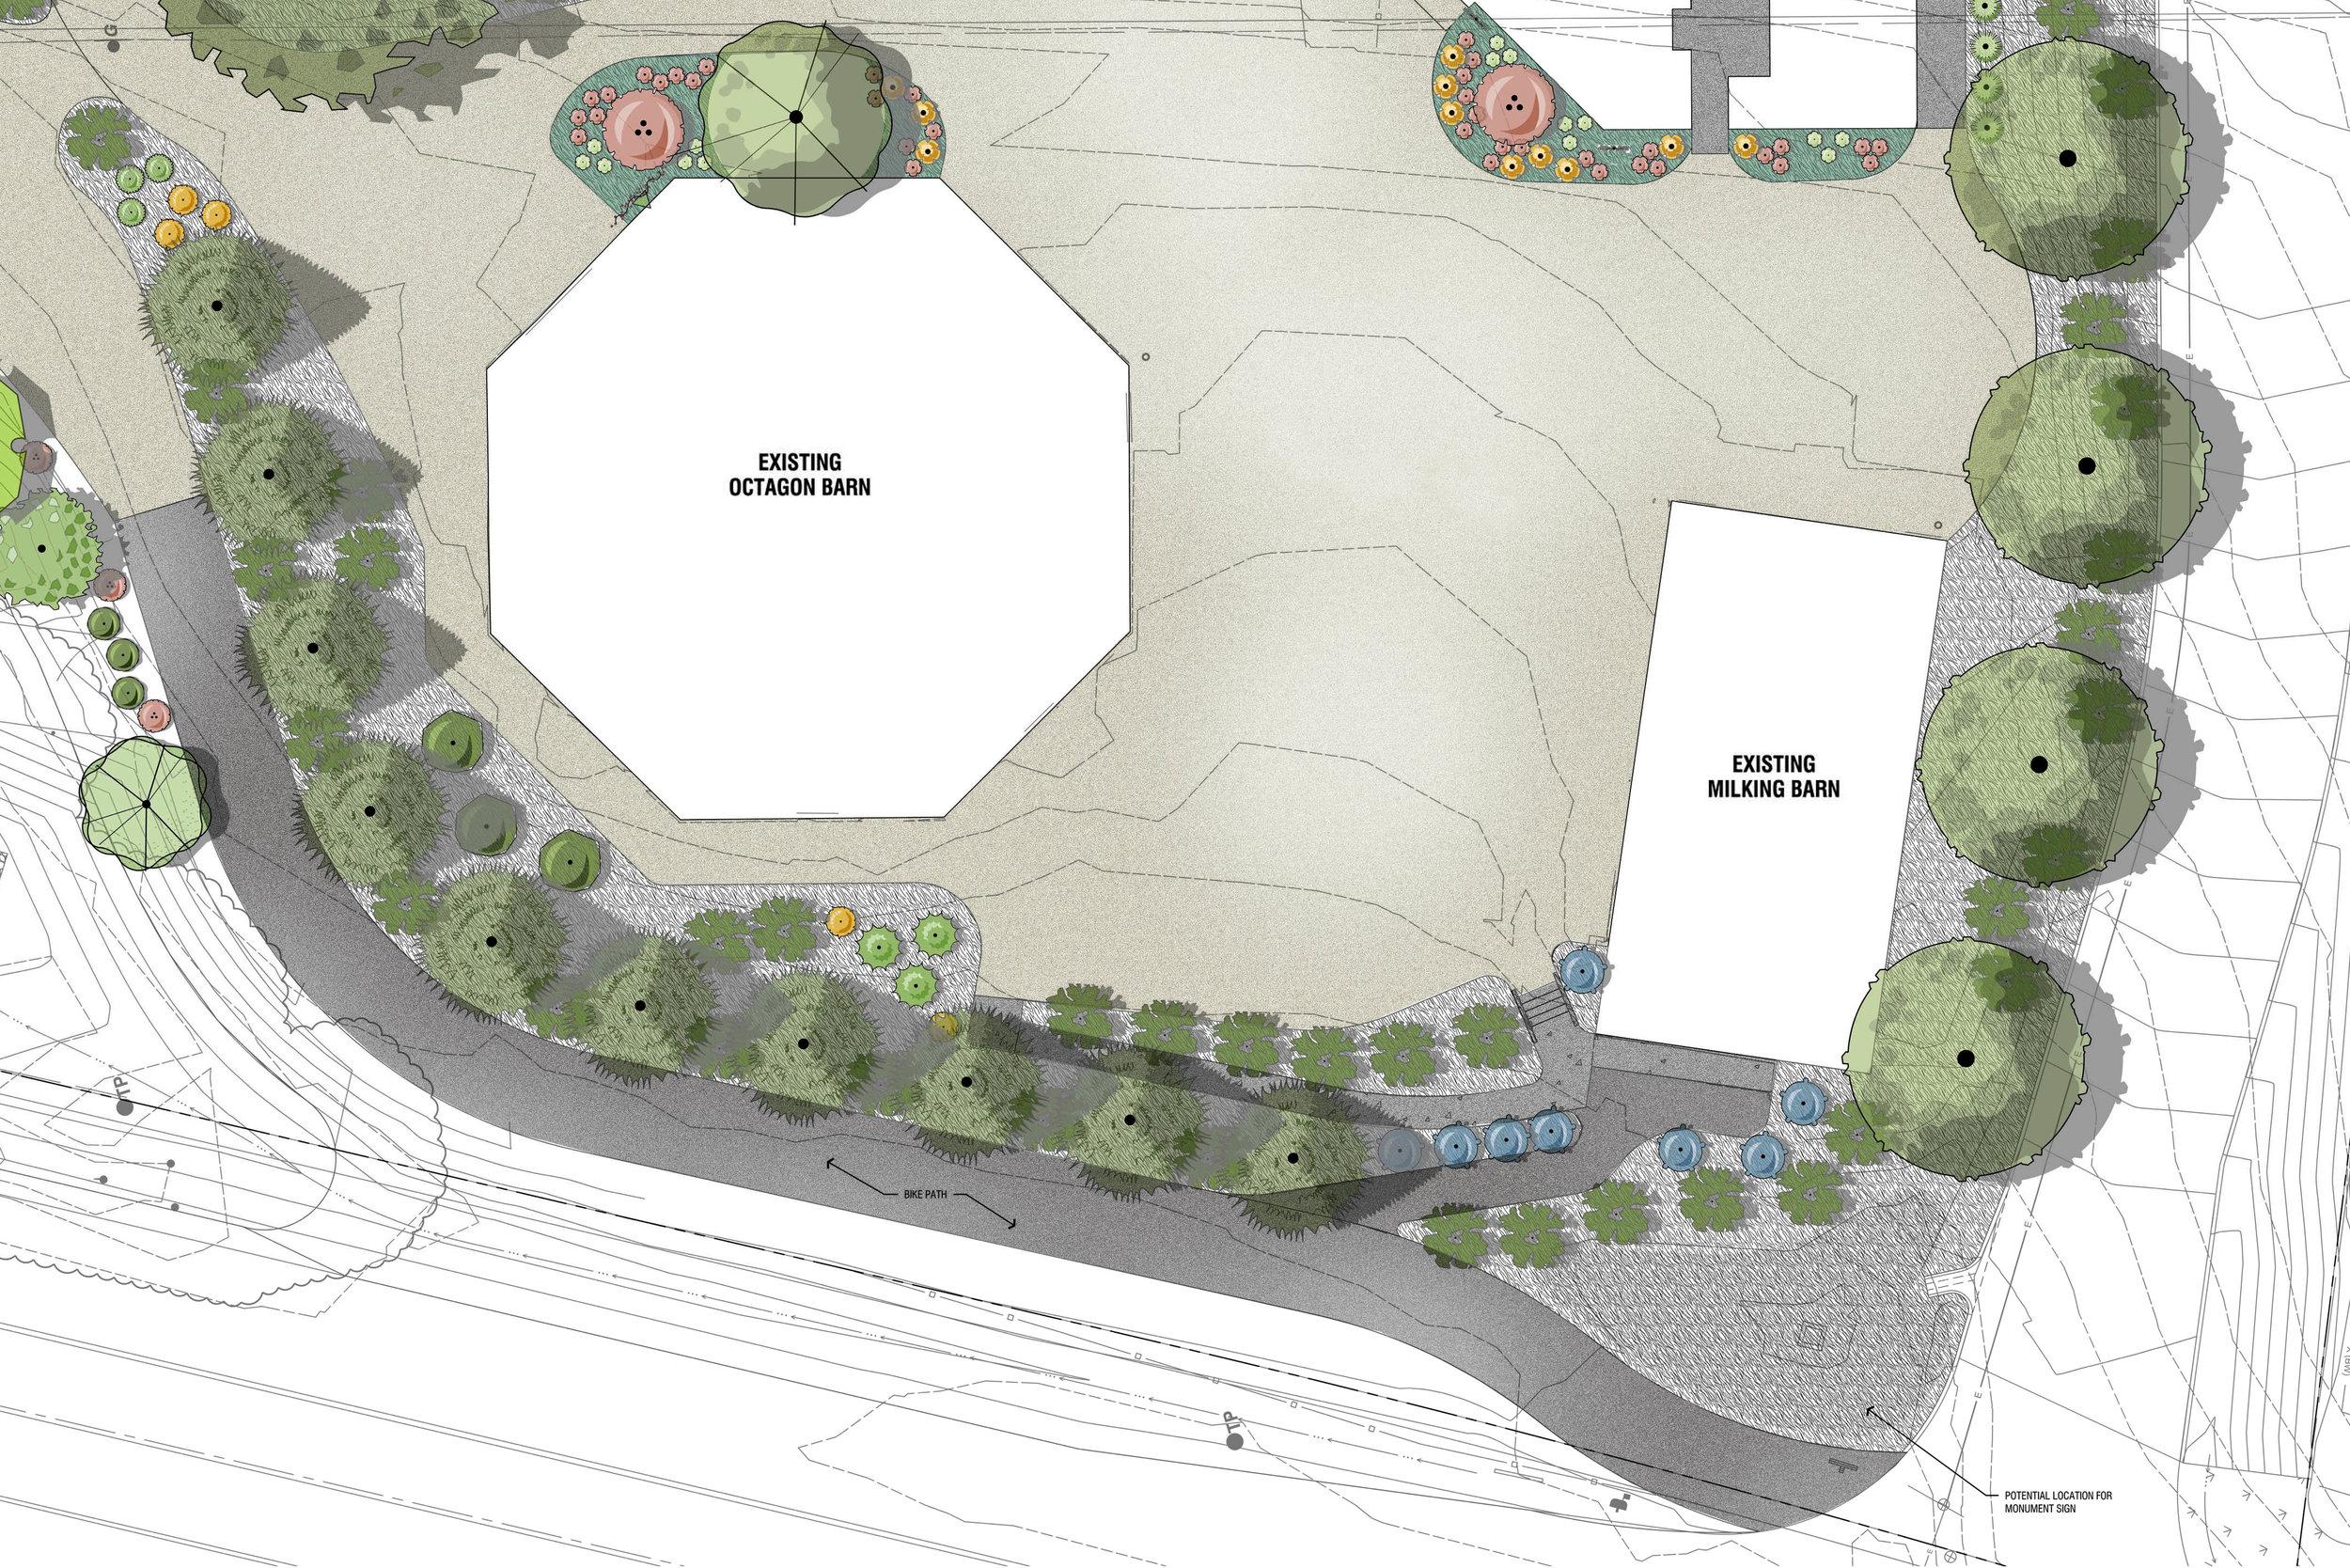 Landscape Architecture Ten Over Studio San Luis Obispo Octagon Barn.jpg